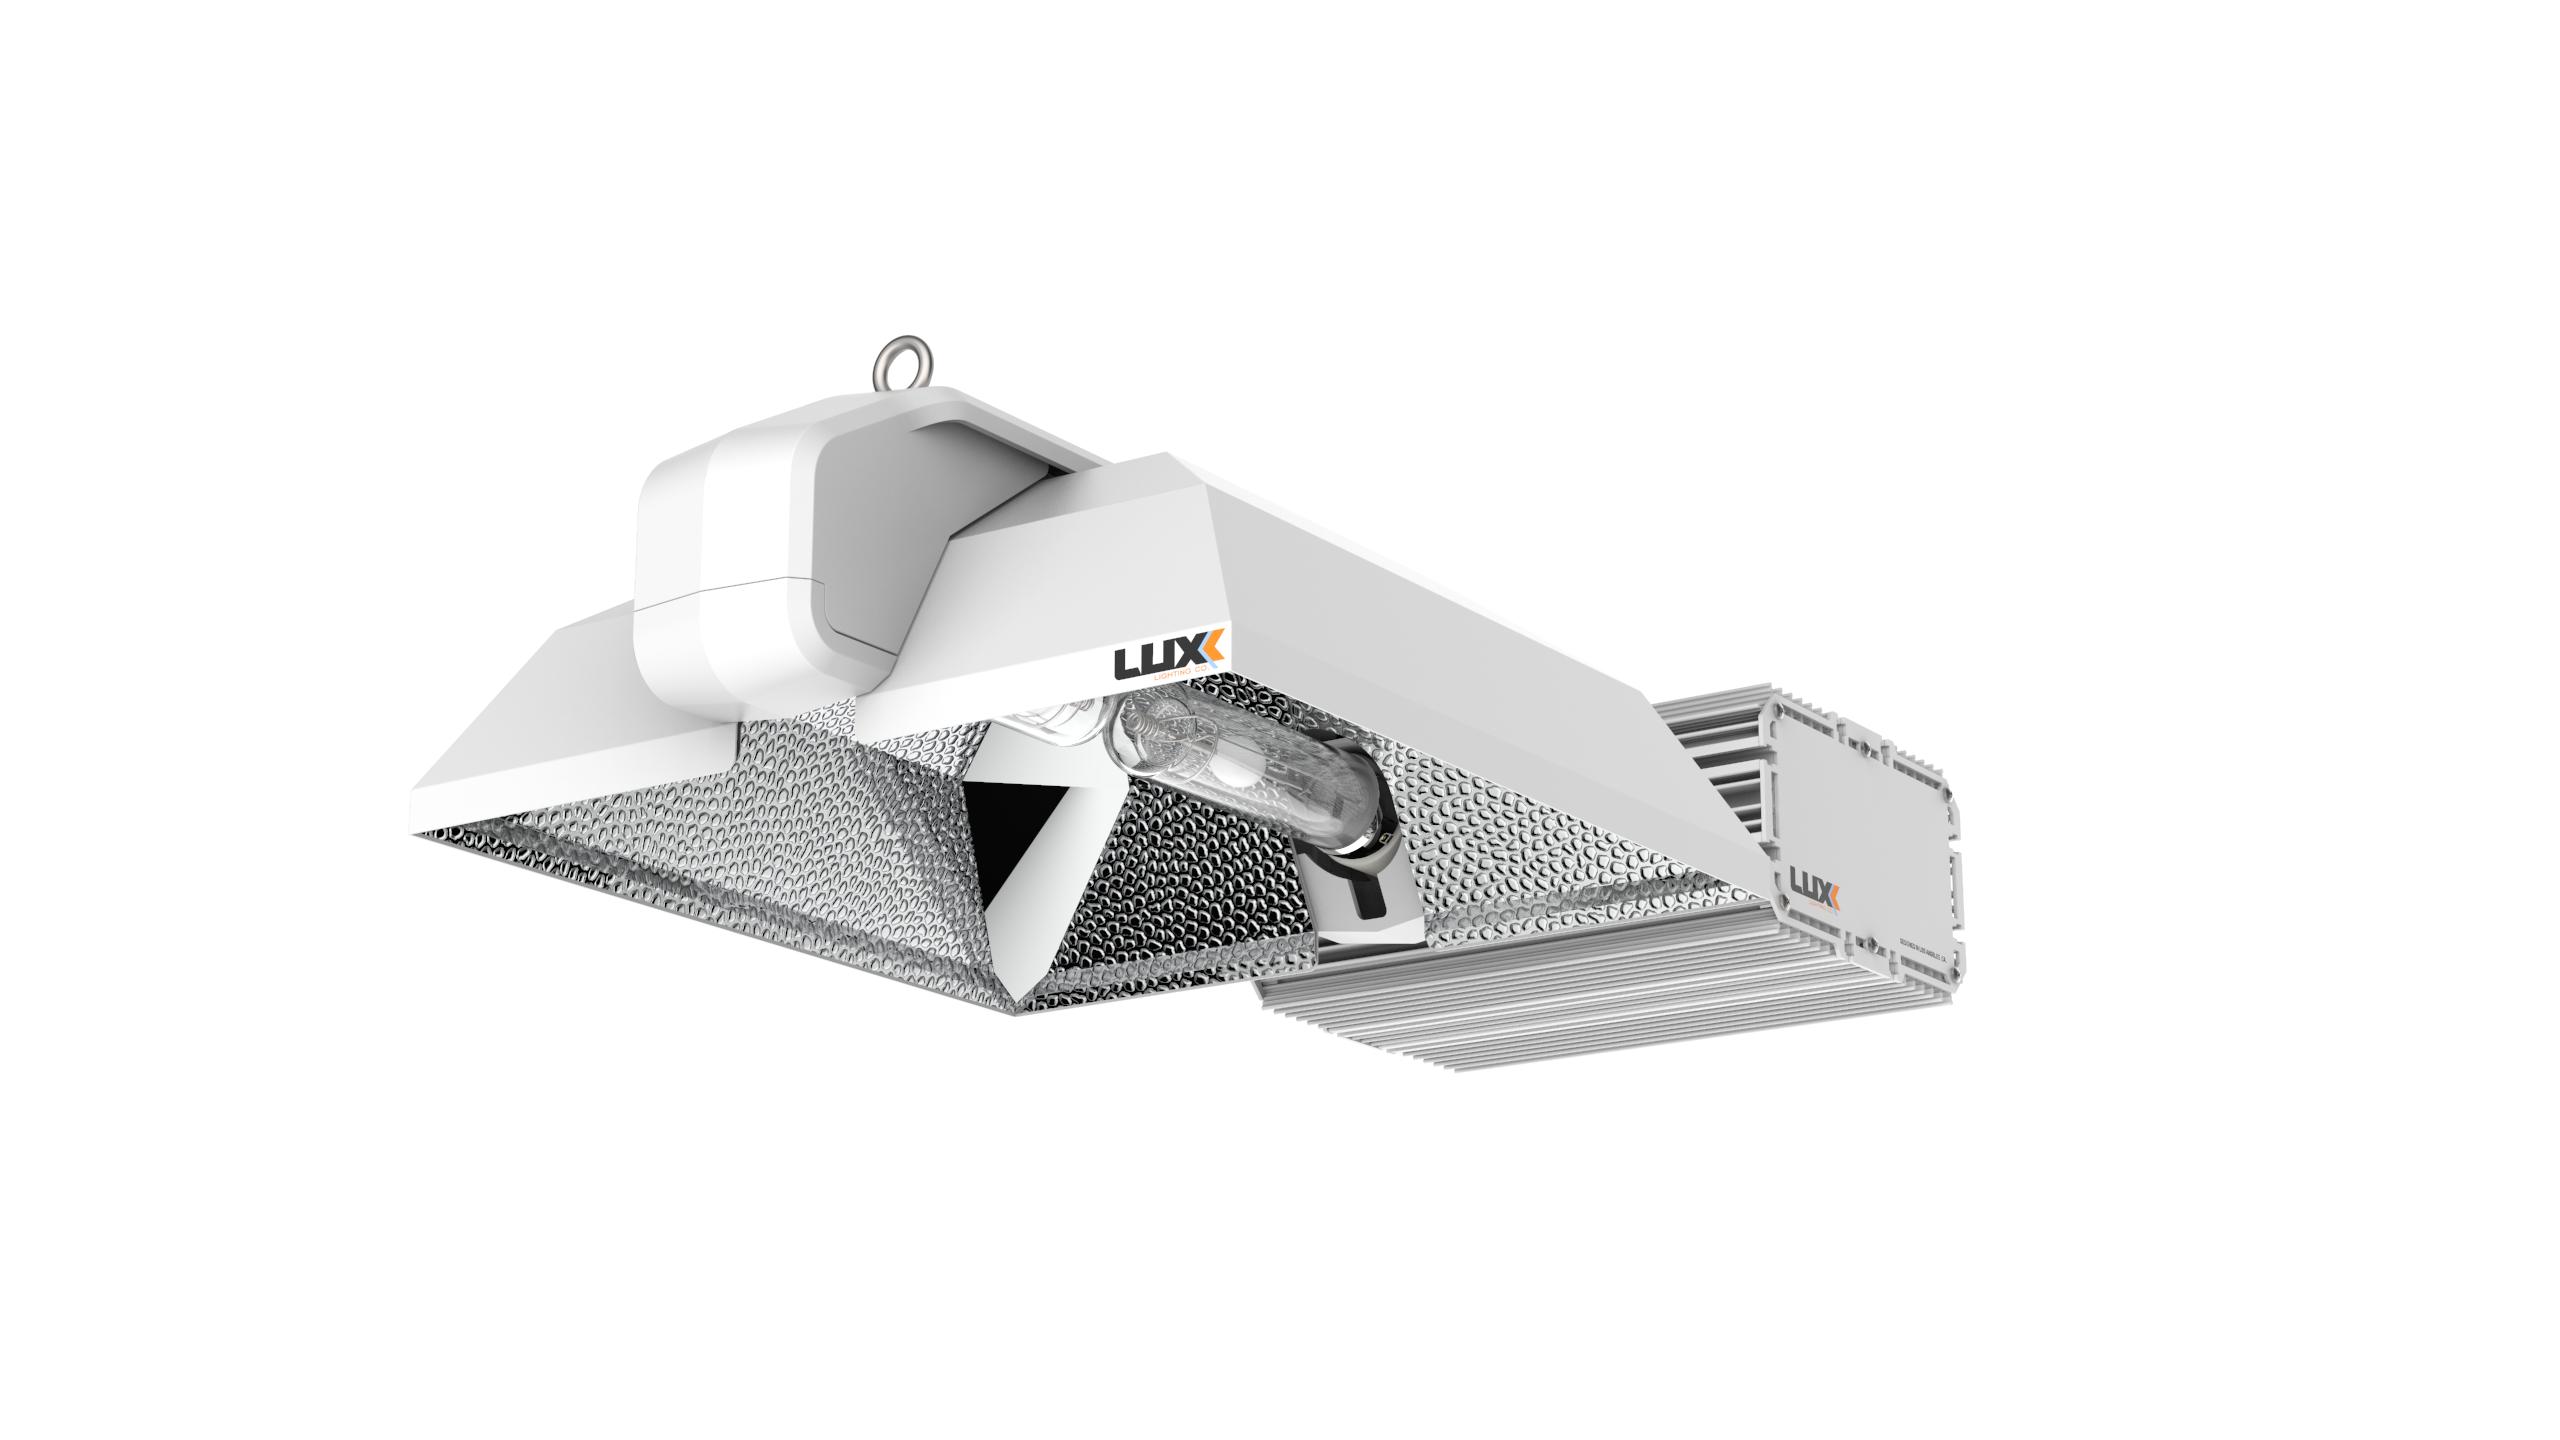 LUXX FIXTURE - CMH 630 WATTS - 347V + 4200°K BULB (1)